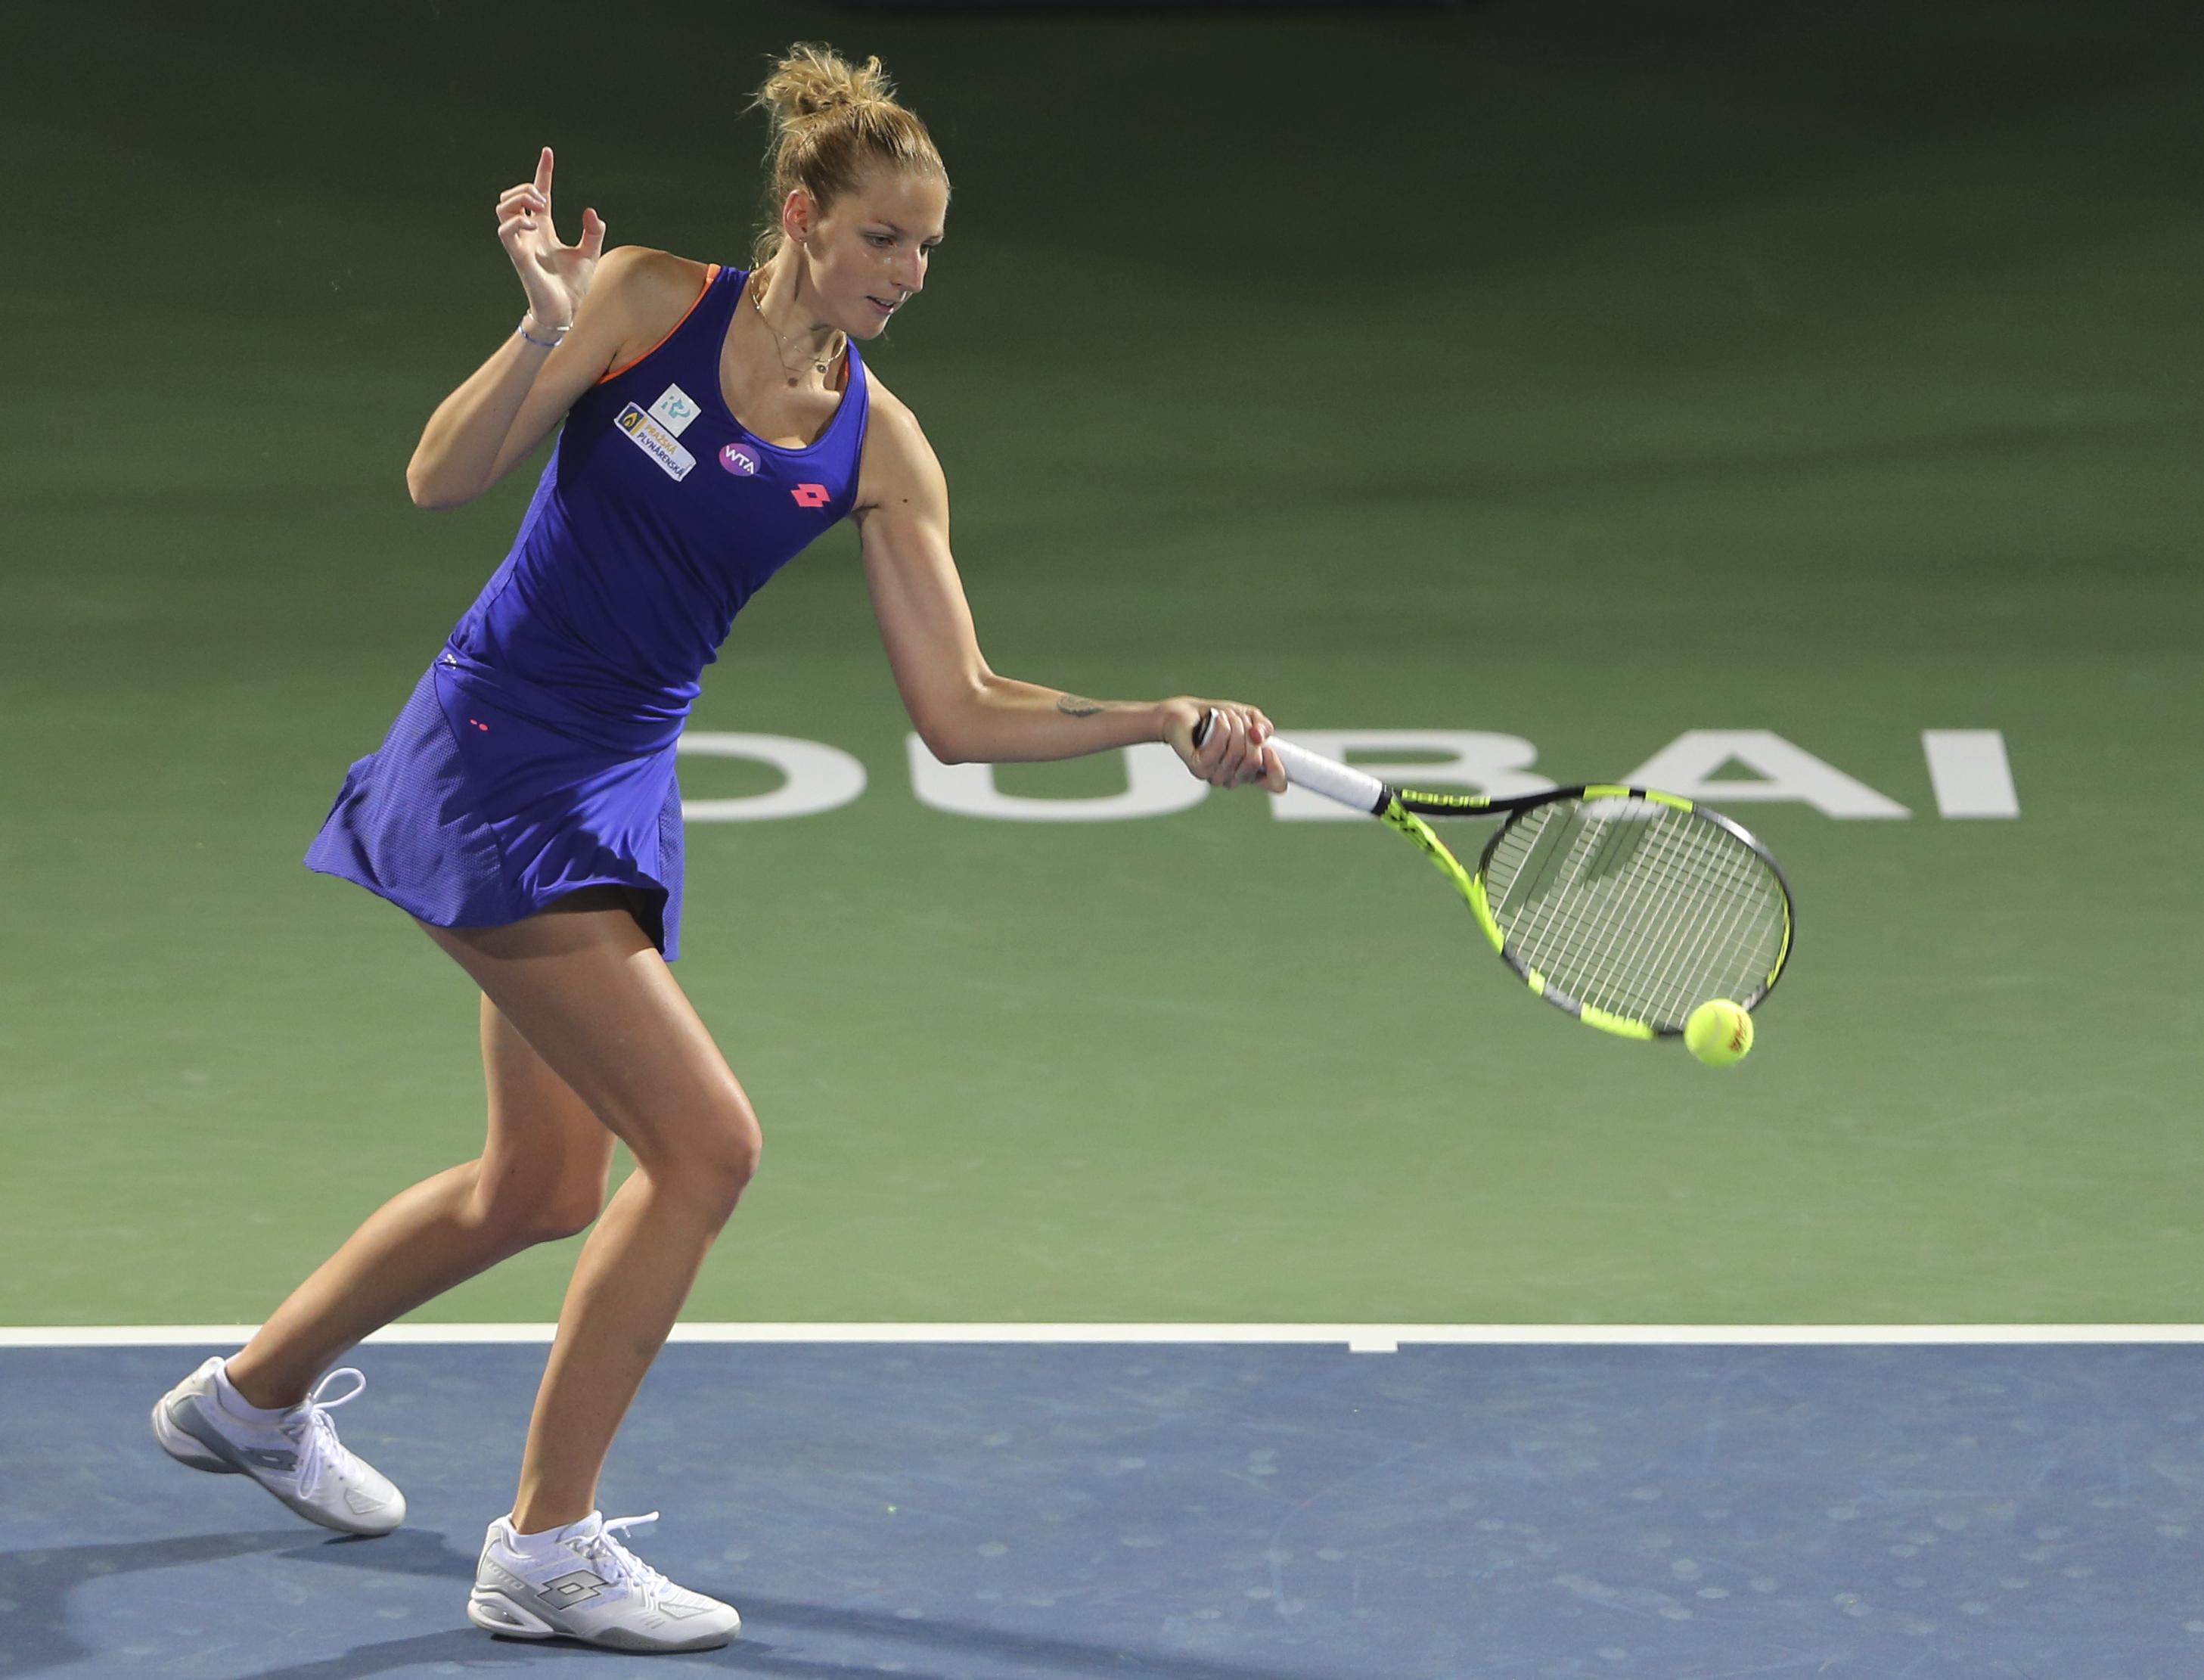 Kristyna Pliskova of Czech Republic returns the ball to Roberta Vinci of Italy during the Dubai Tennis Championships, in Dubai, United Arab Emirates, Sunday, Feb. 19, 2017. (AP Photo/Kamran Jebreili)